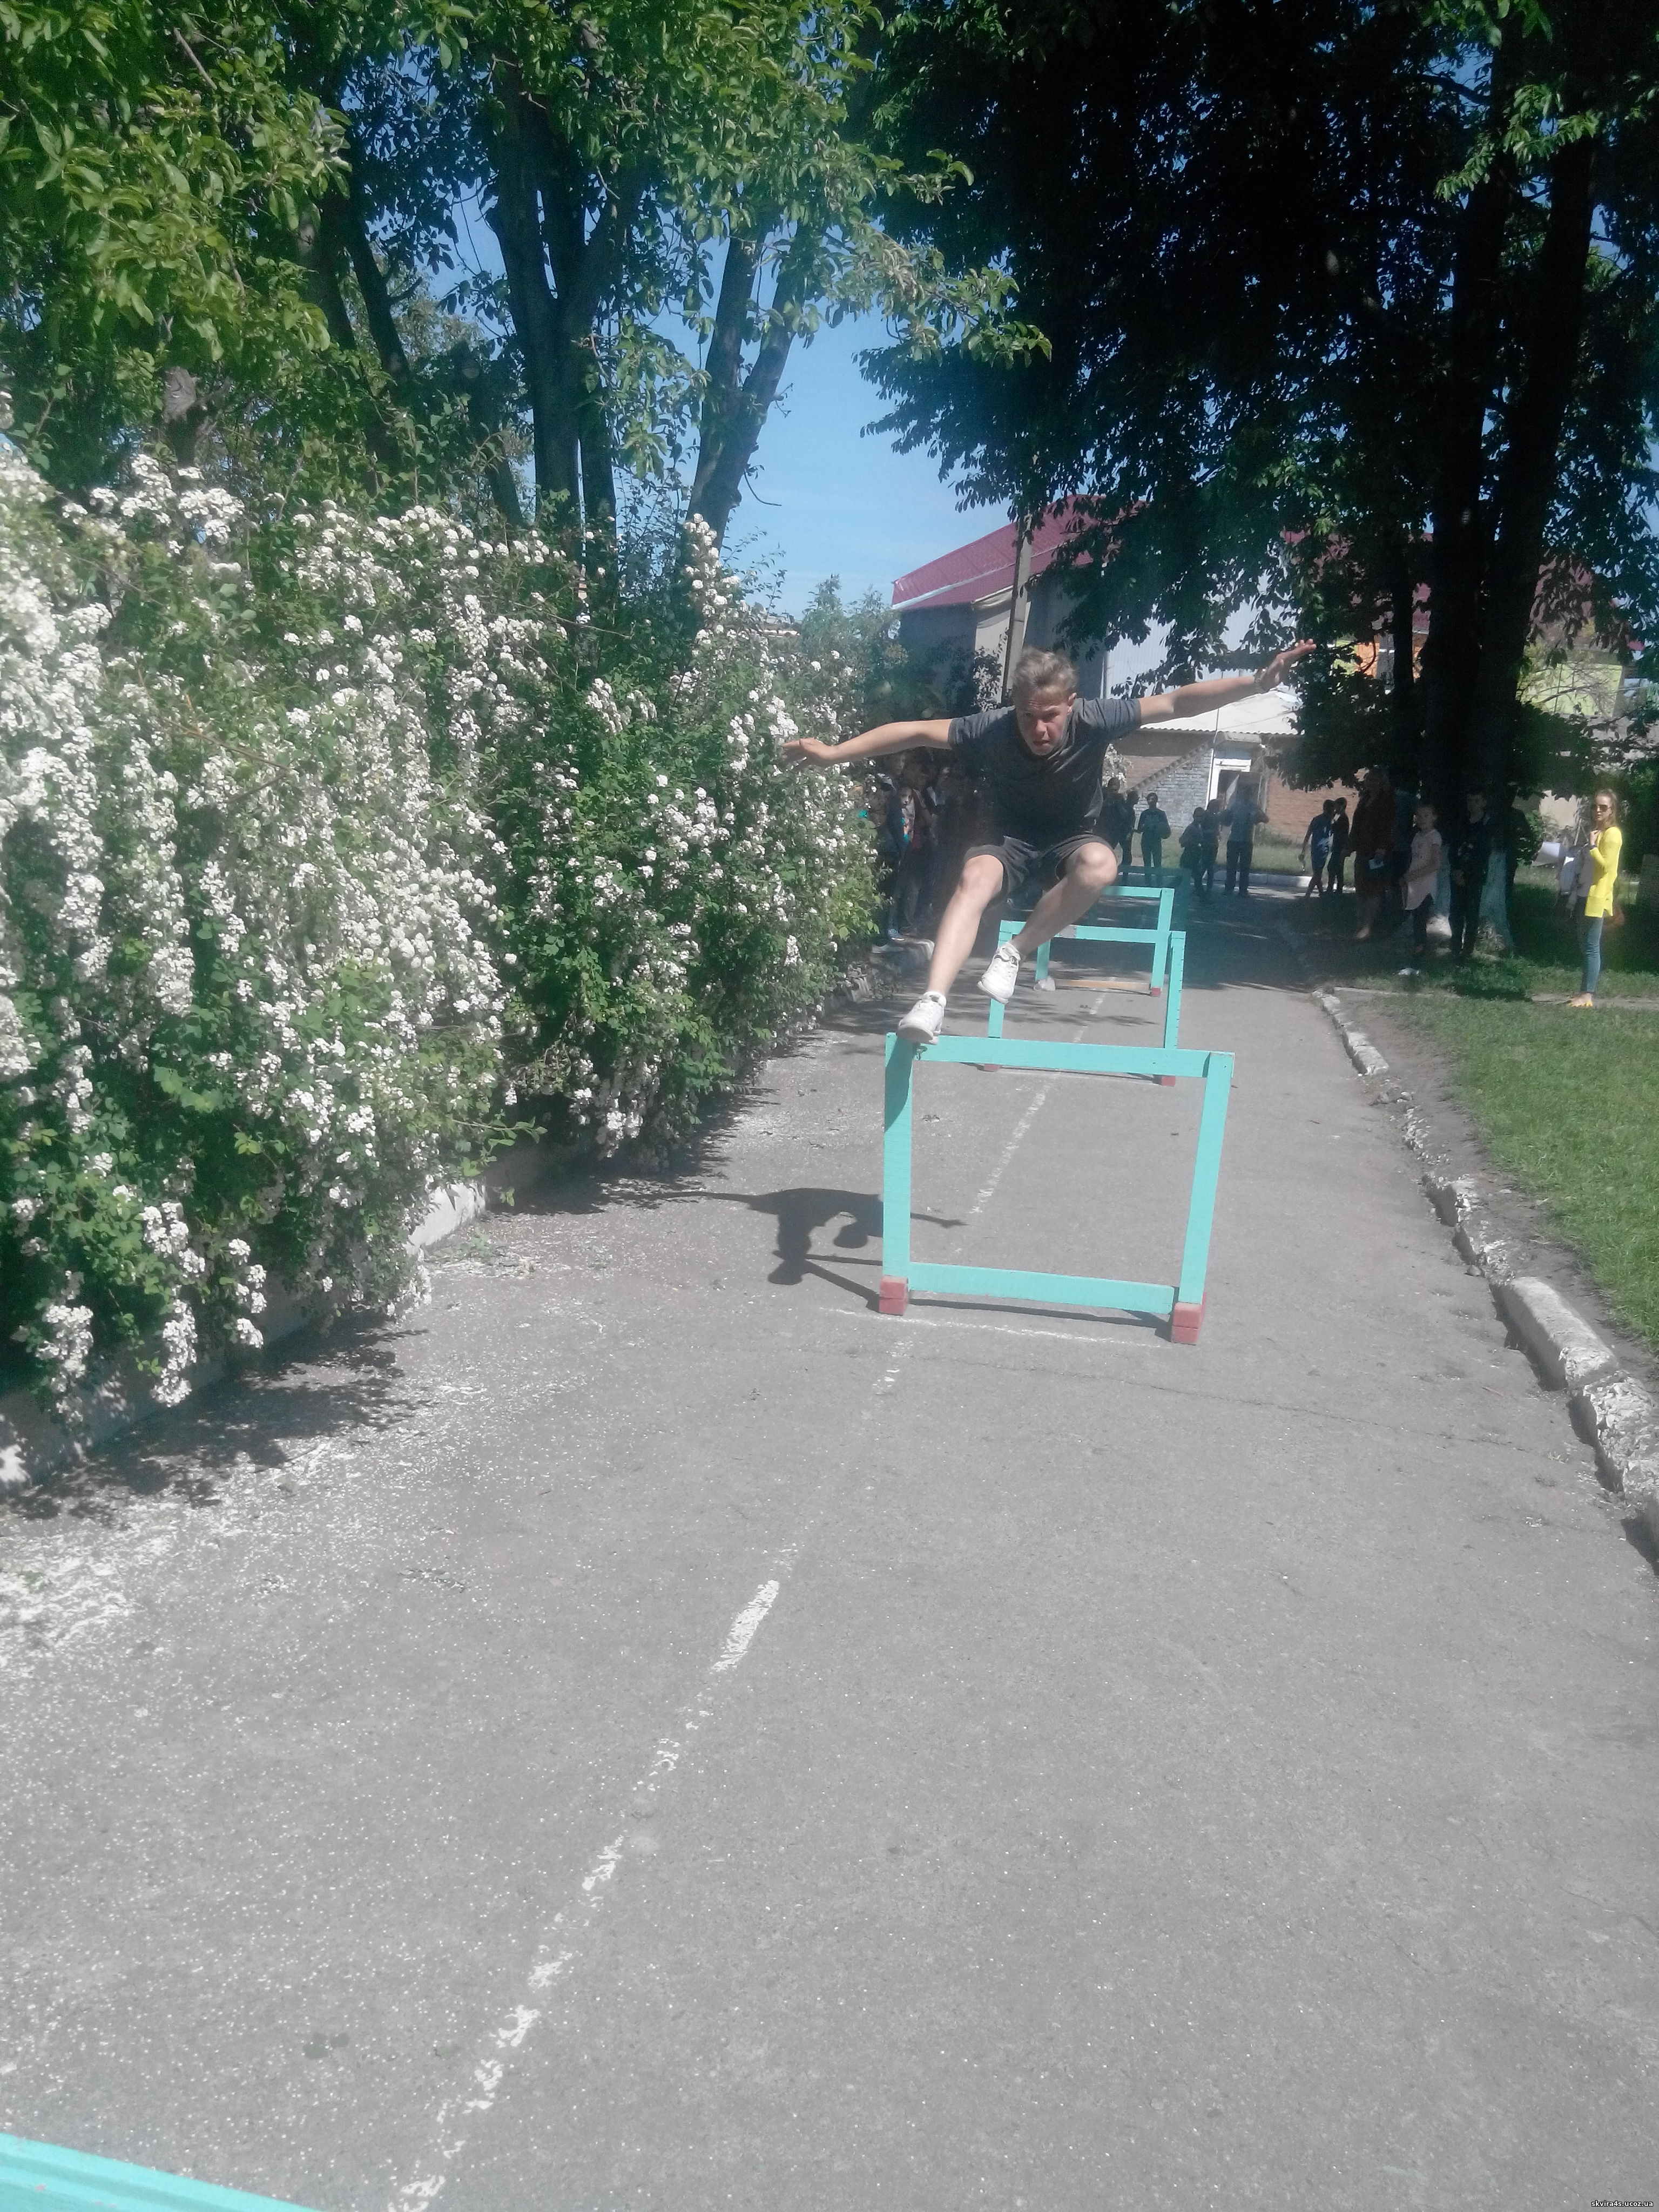 http://skvira4s.ucoz.ua/foto/24-05-17-1/2017524105129.jpg